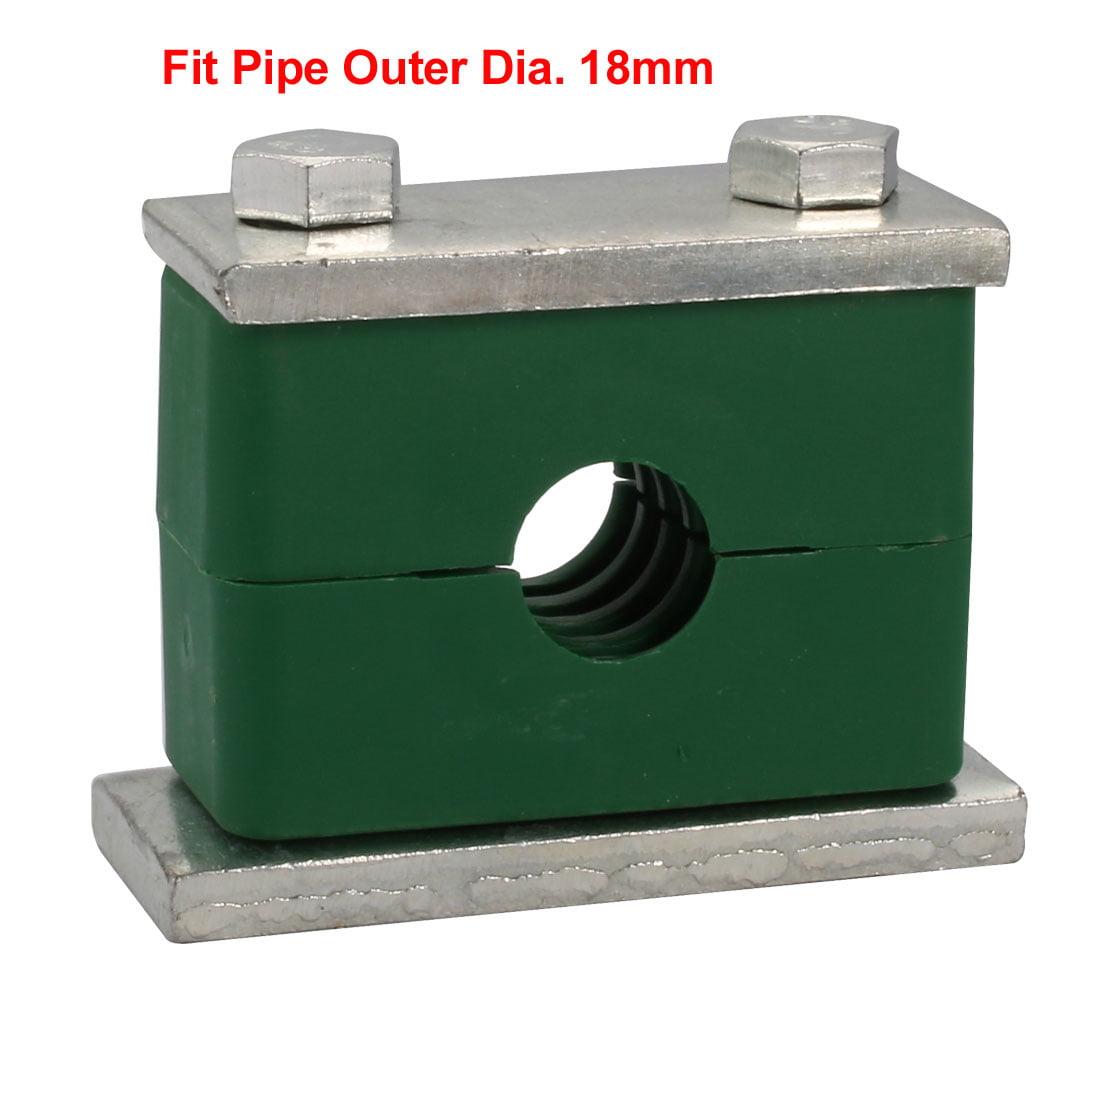 18mm Fitting Dia Polypropylene Aluminum Heavy Series Hose Pipe Tube Clamp 2pcs - image 1 of 4